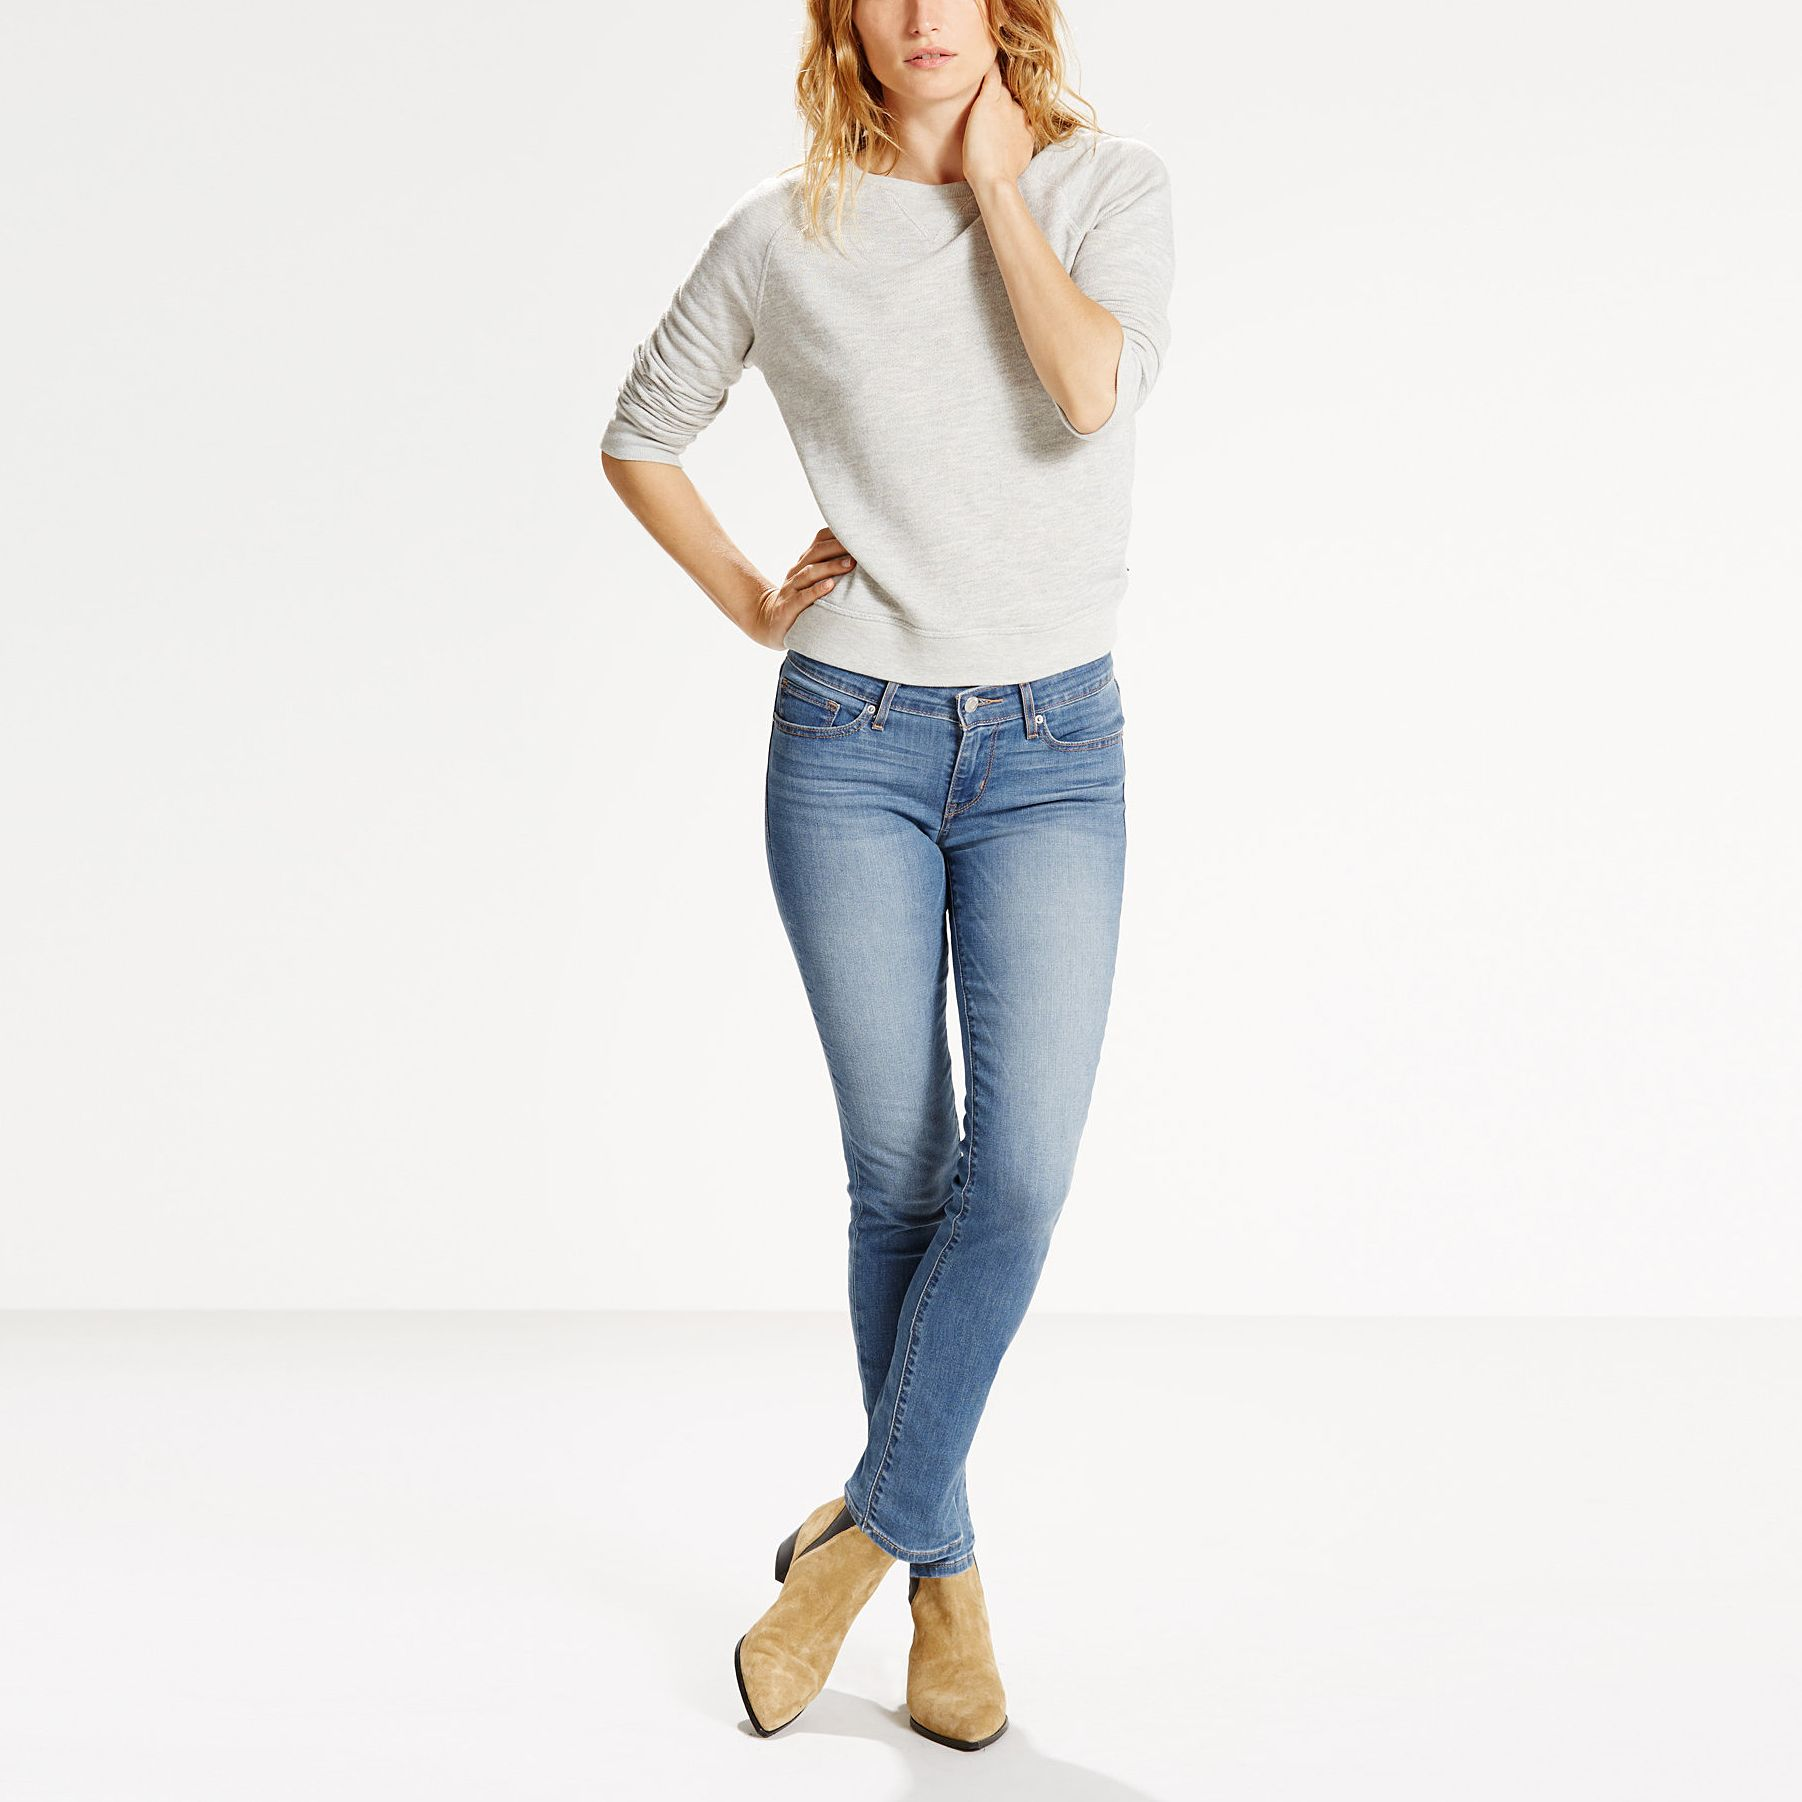 18881 0006 Levis Bayan Jean Pantolon 711 Skinny Skinny Pantolon Levis